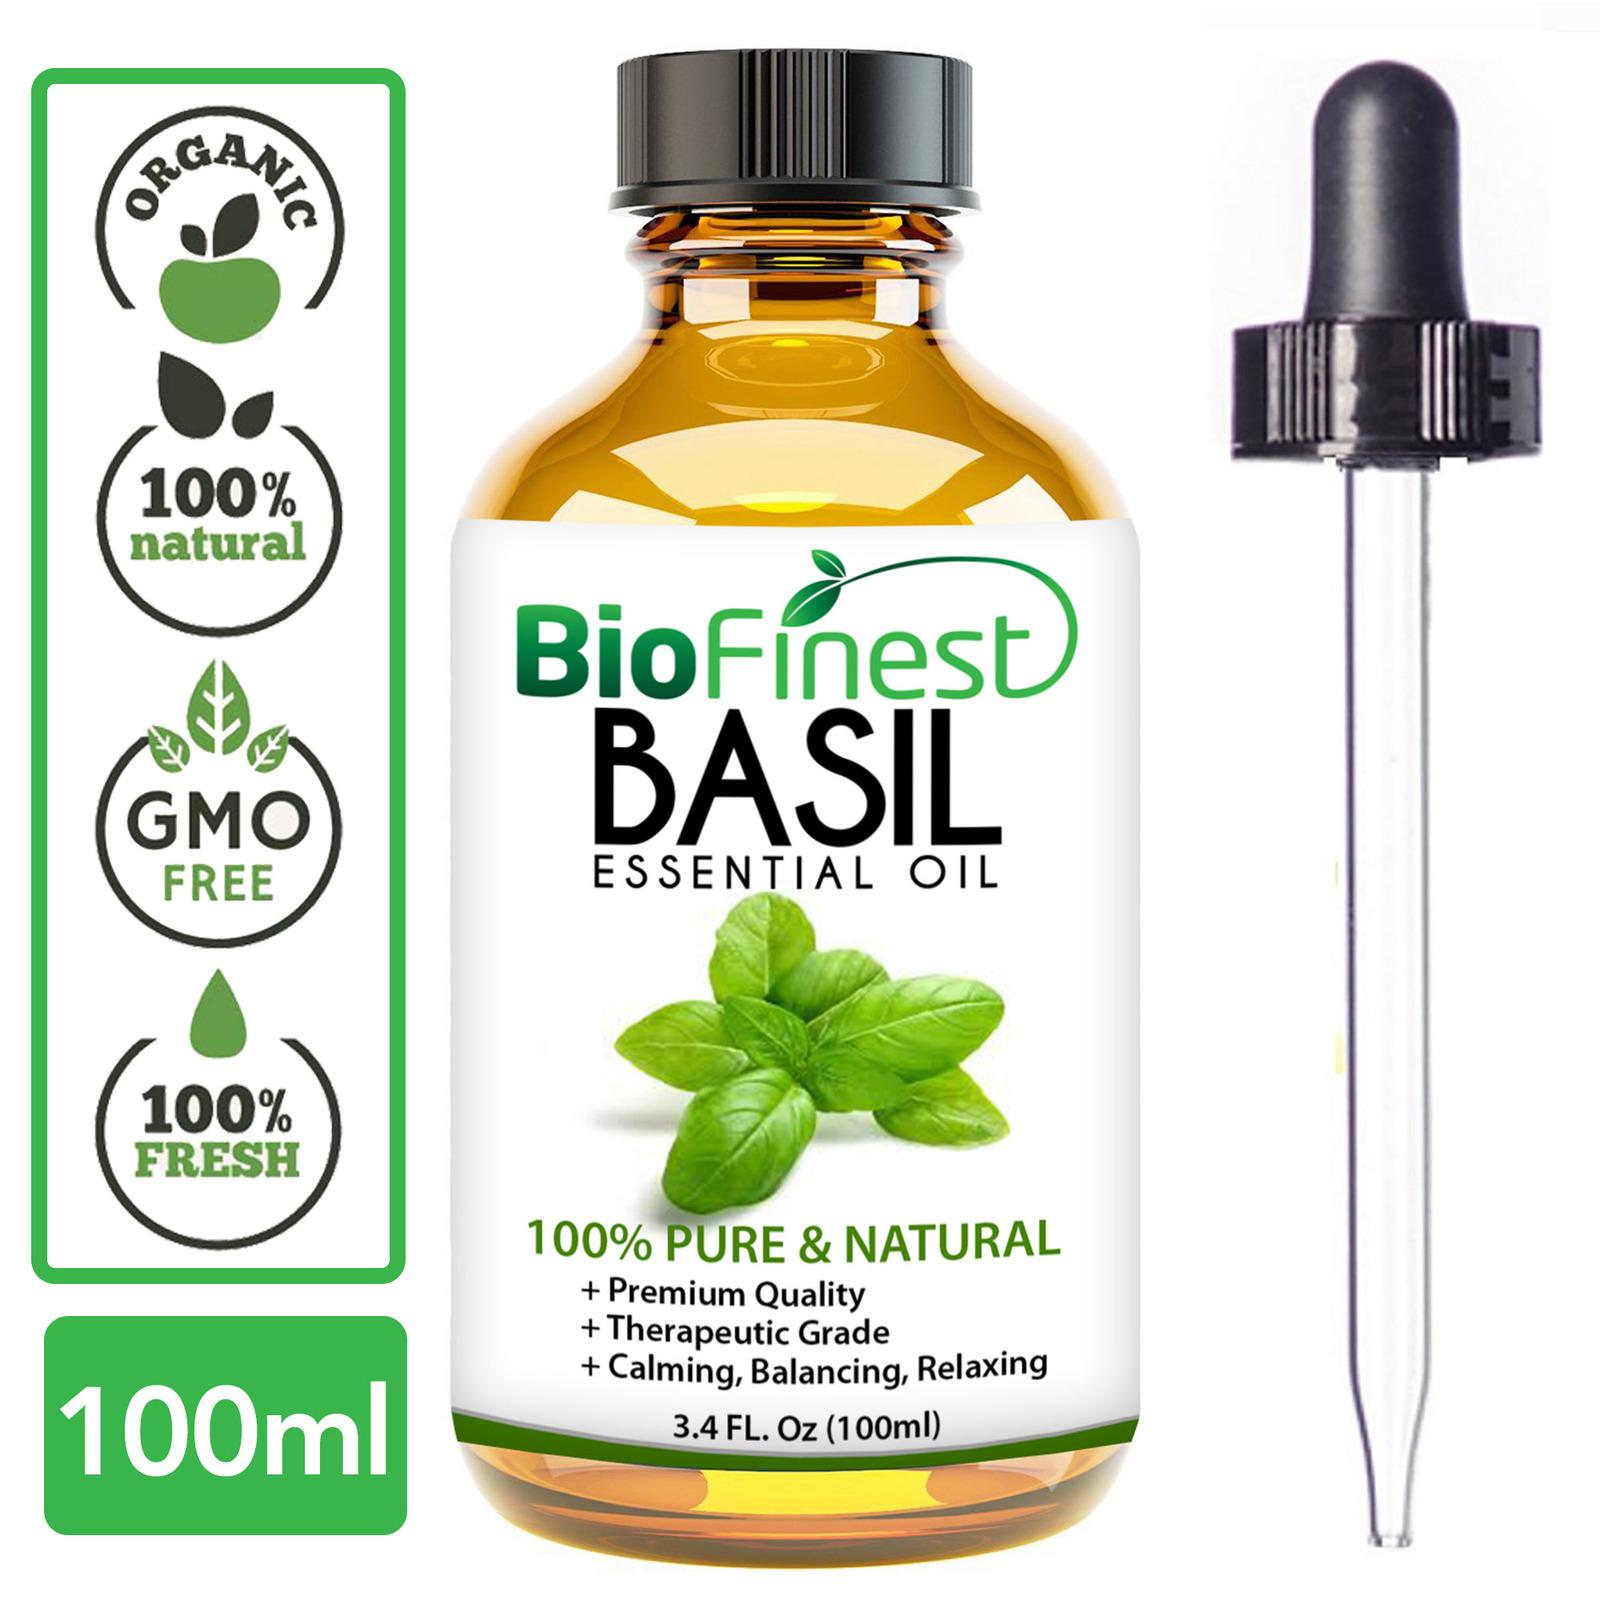 Biofinest Sweet Basil Essential Oil - Organic Pure Undiluted